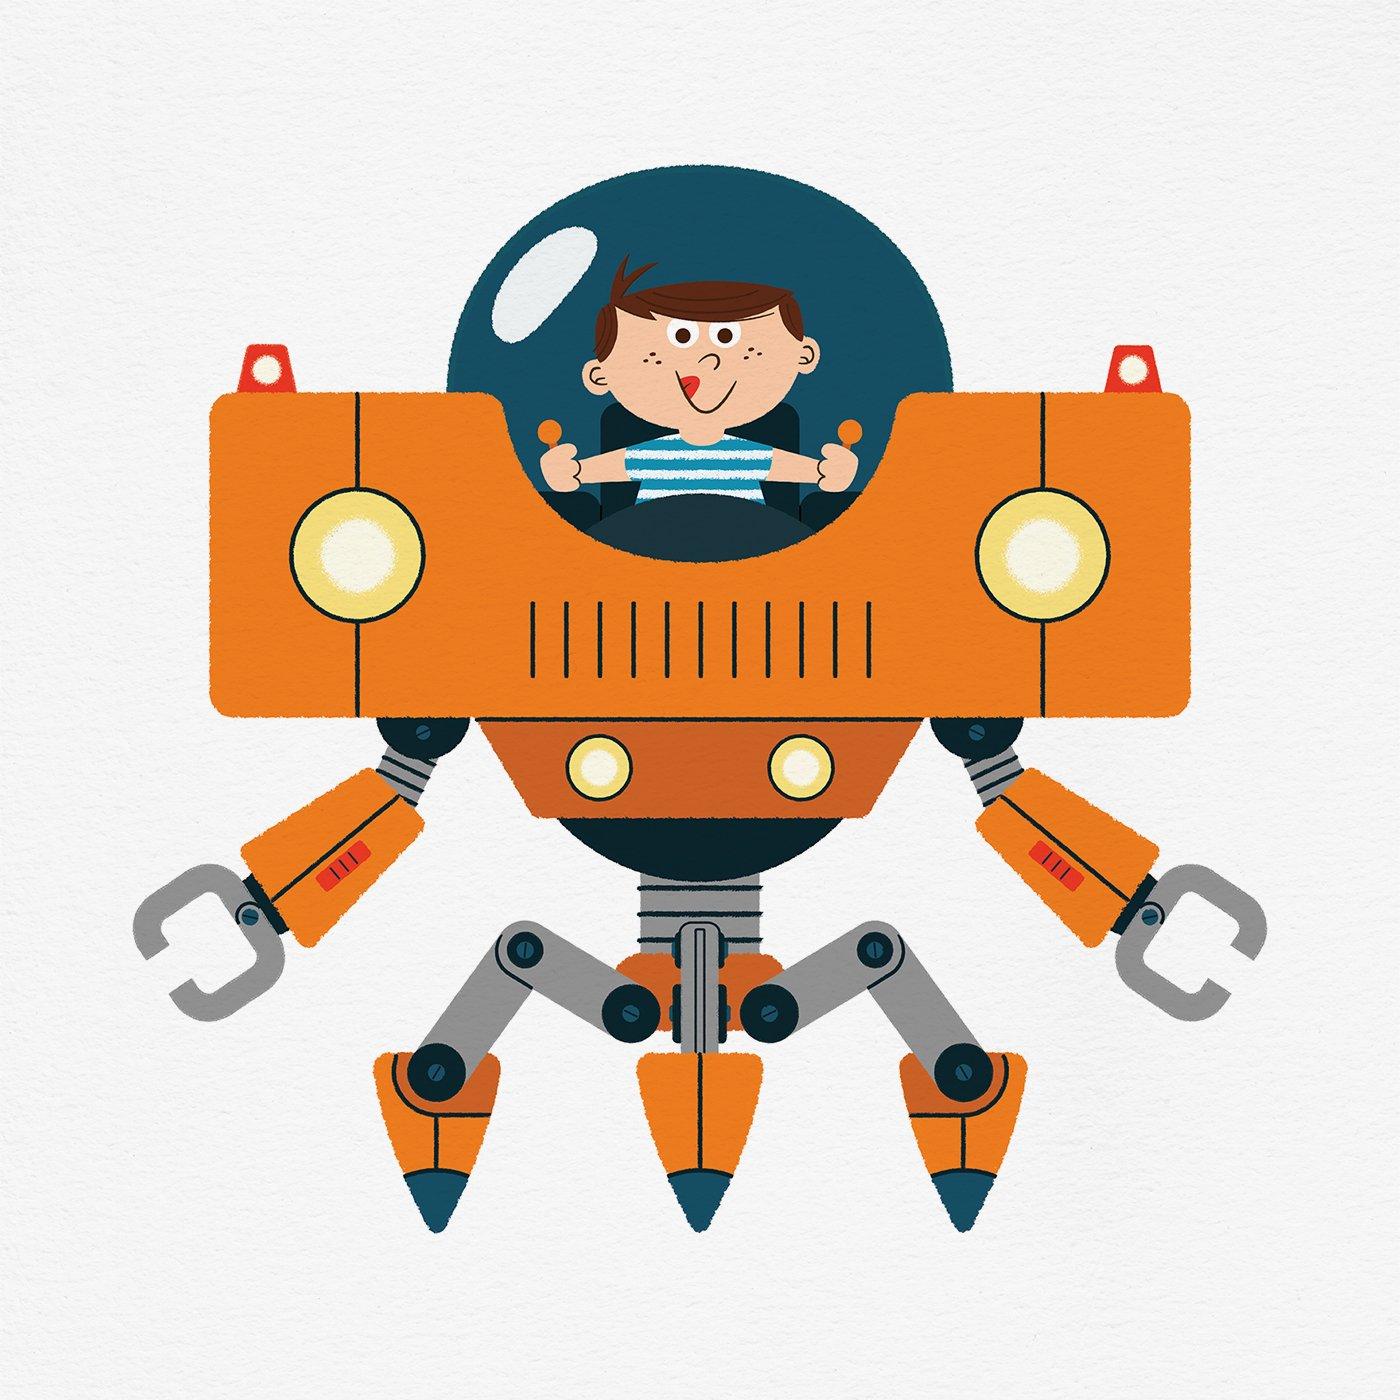 Image of RoboPal - Simon